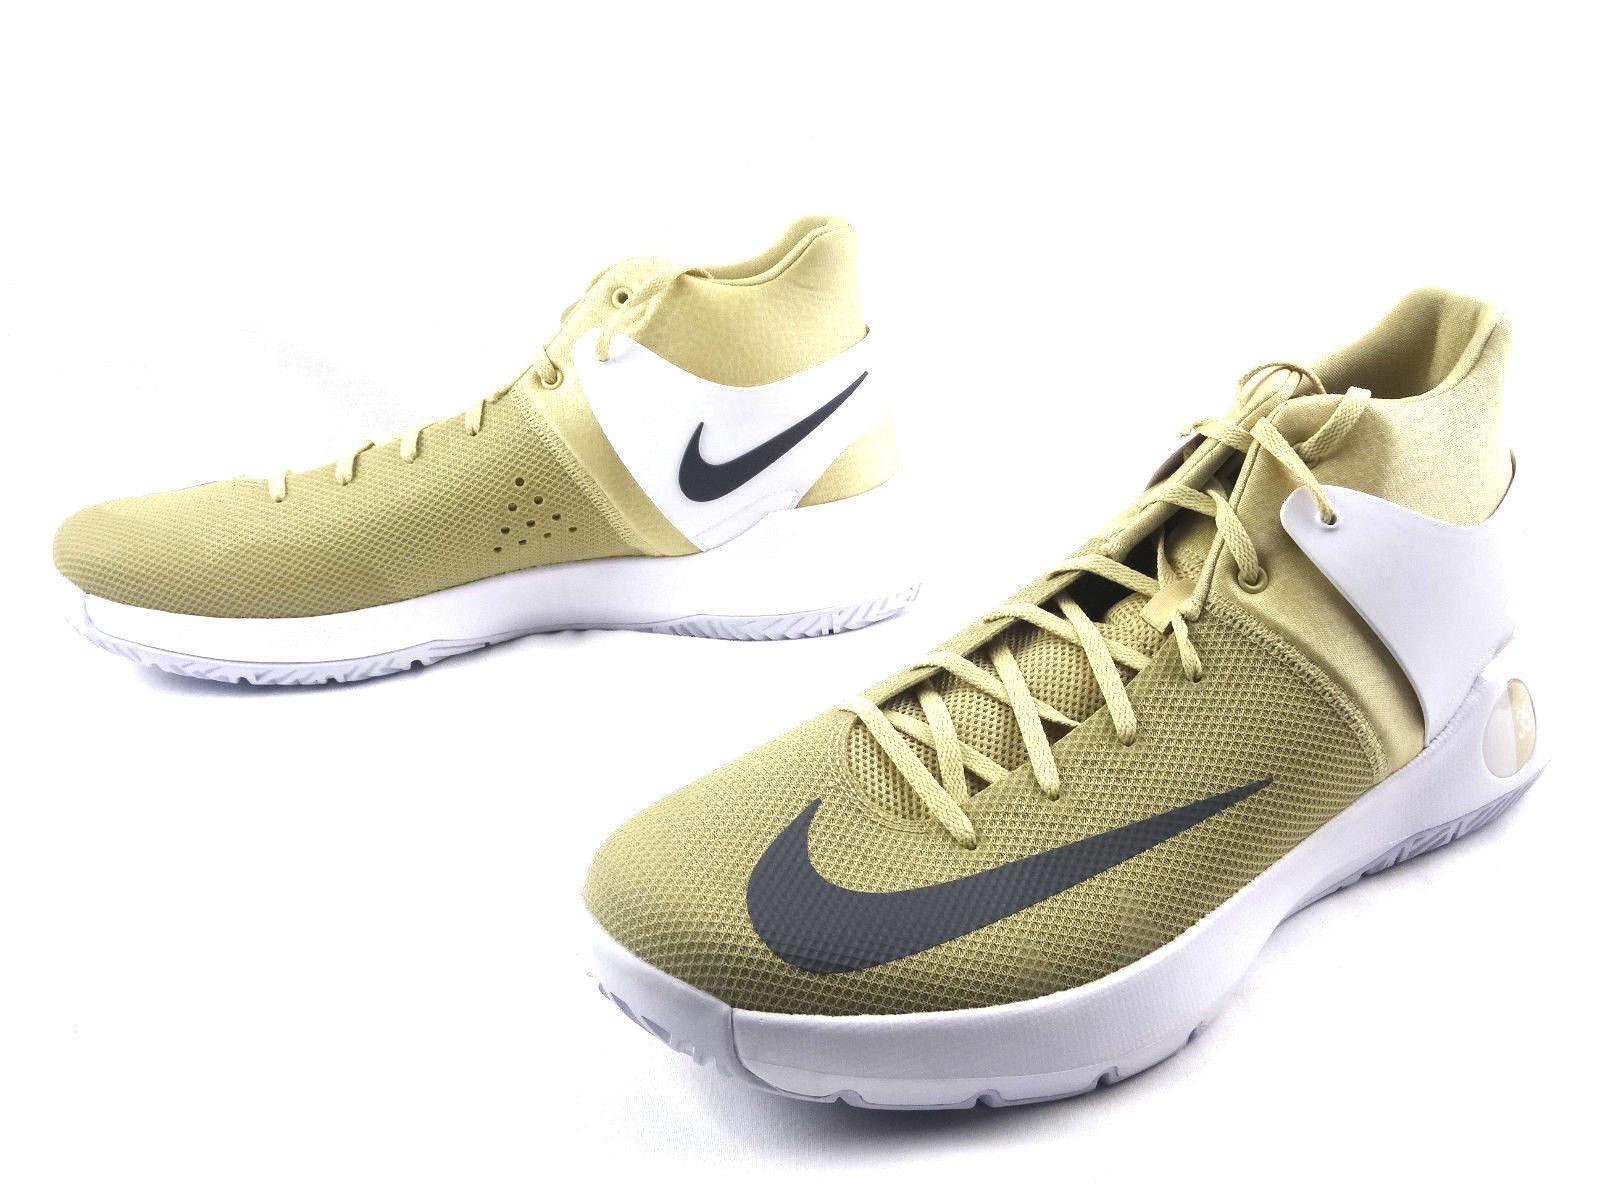 NIKE KD Trey 5 IV 856484-701 Kevin Durant gold WHITE shoes USA Men's Size 17